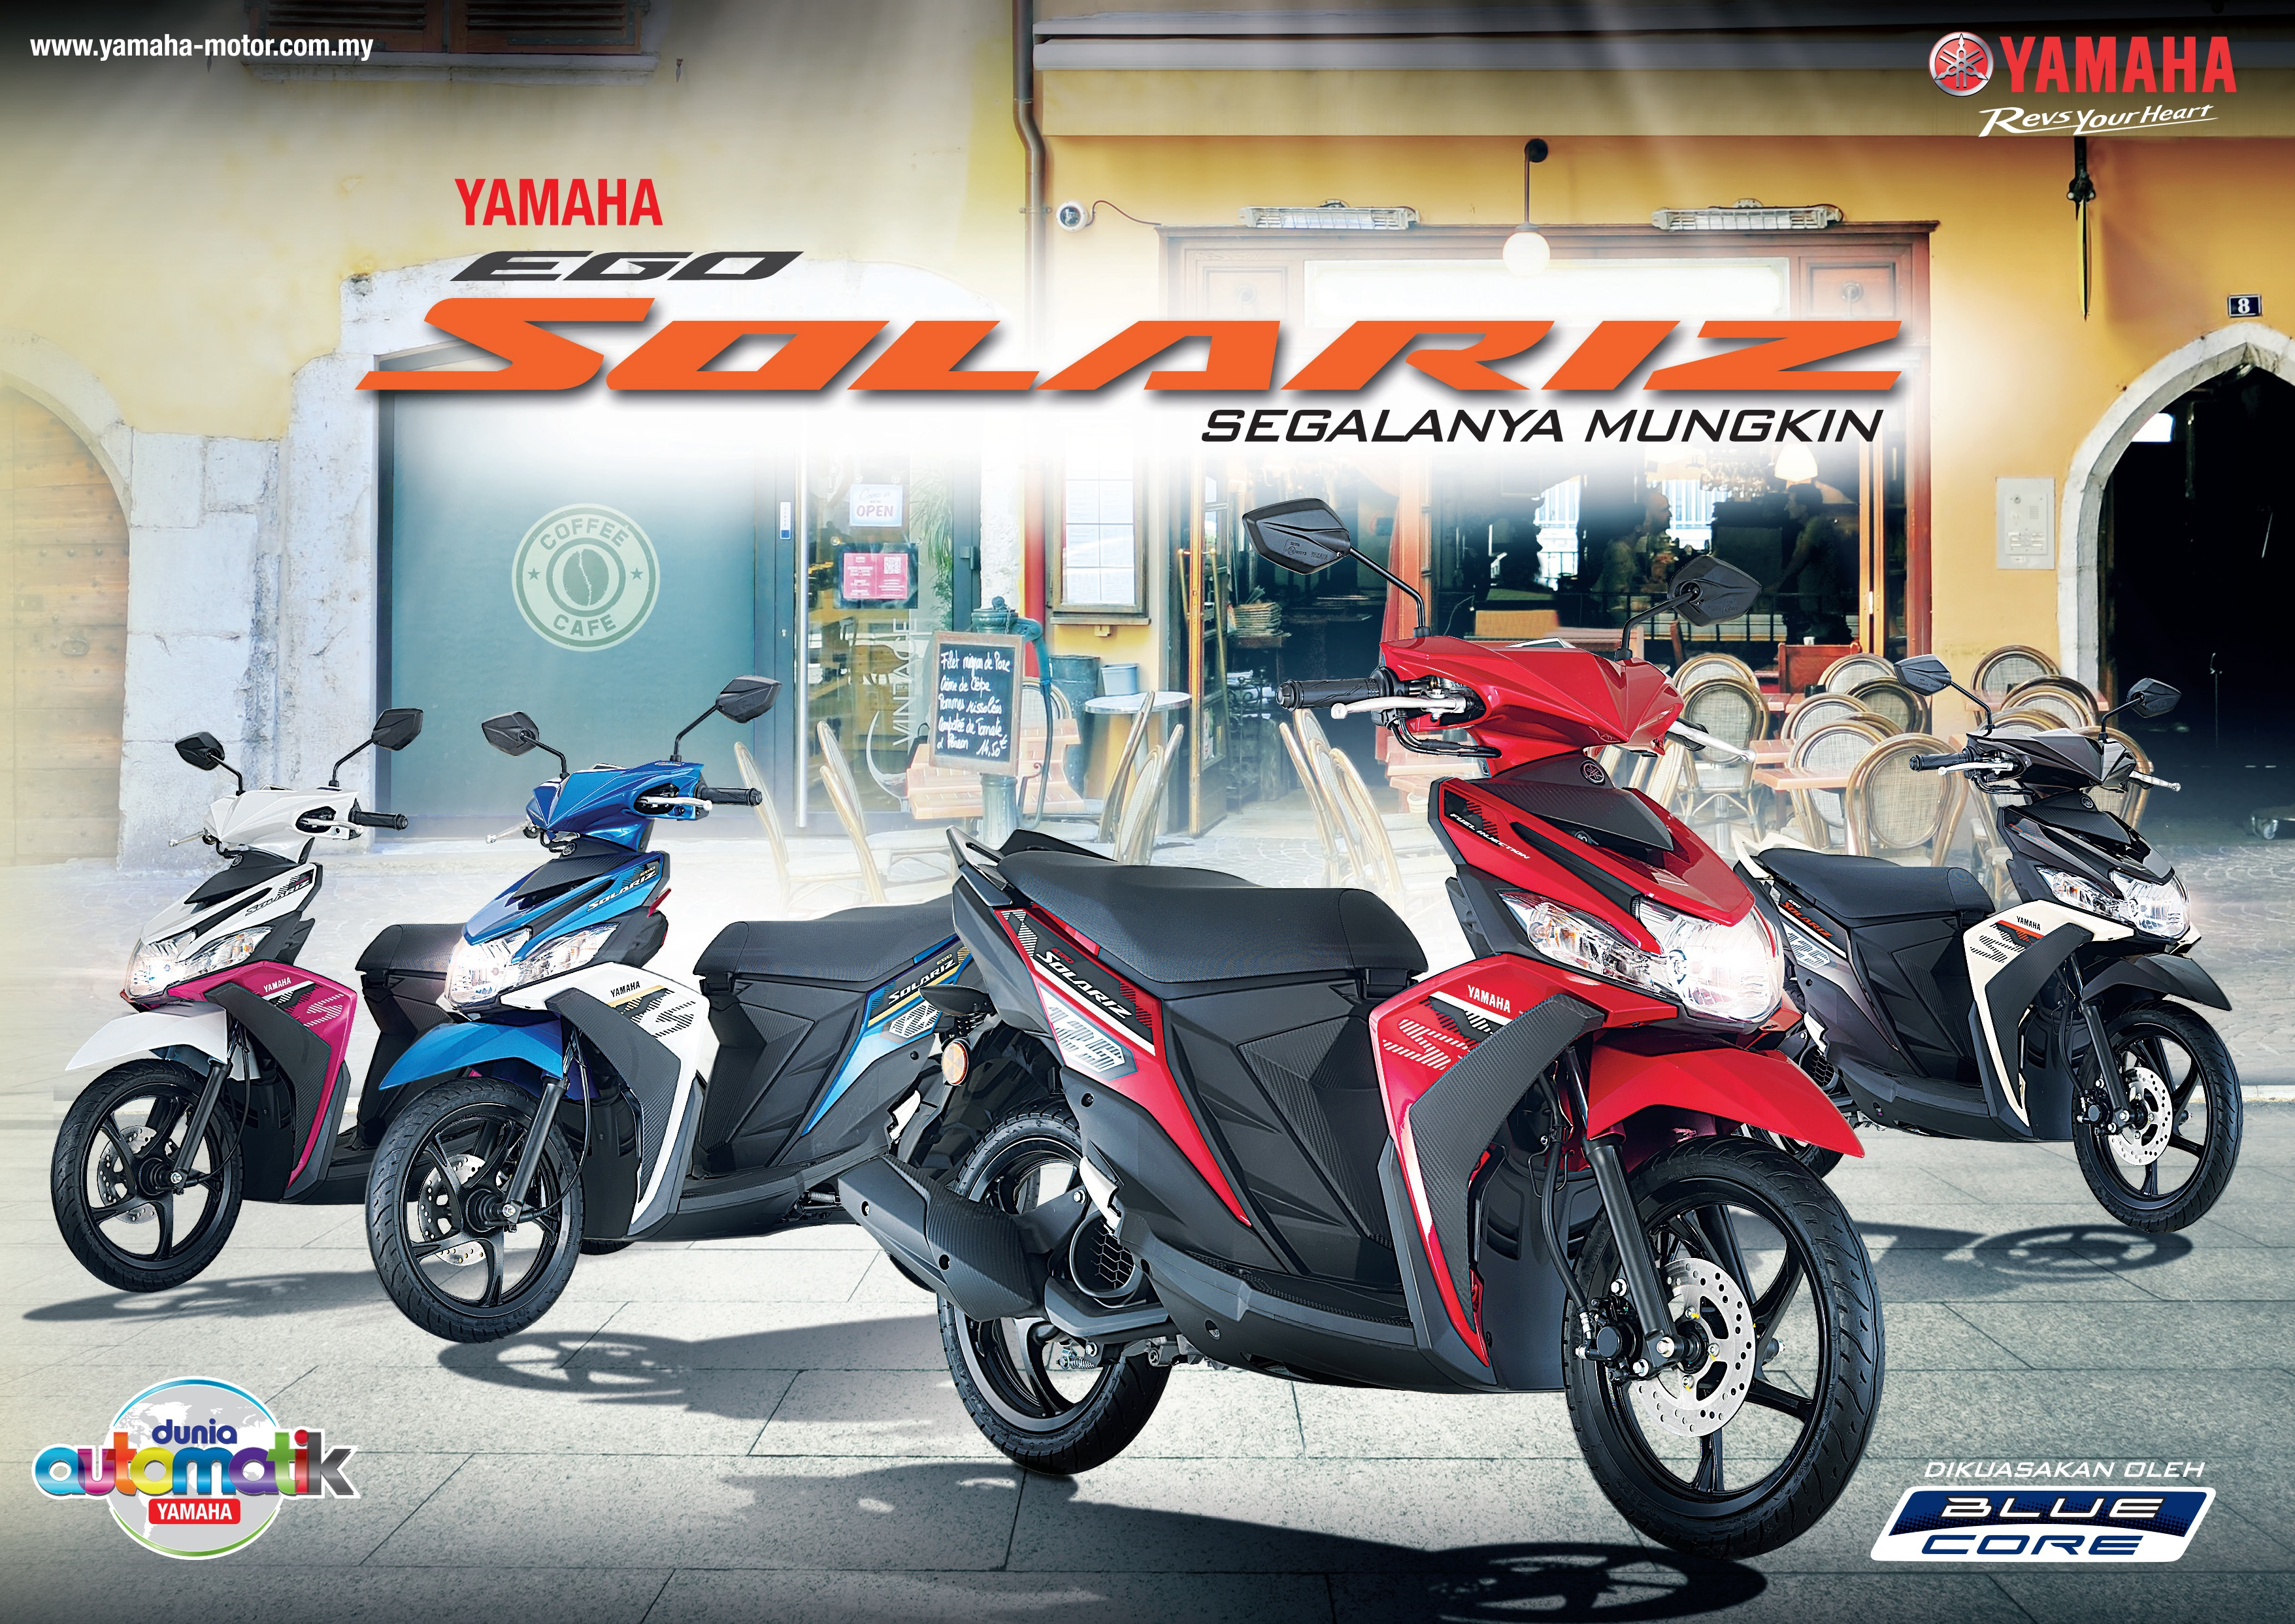 V Power Motor Yamaha Ego Avantiz 125